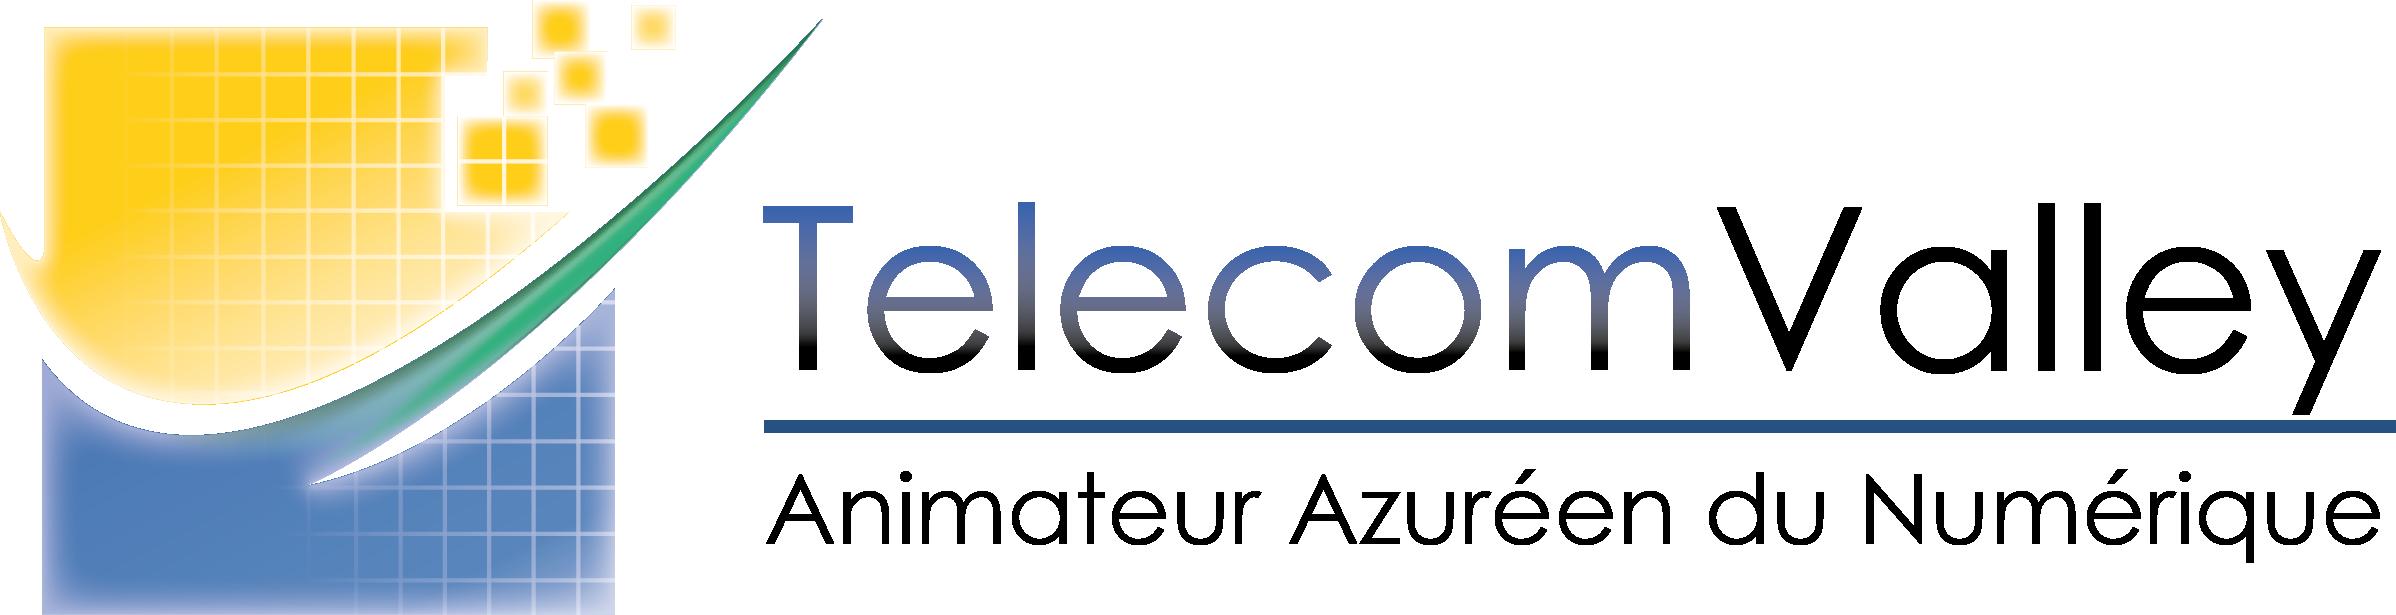 Logo of Telecom Valley